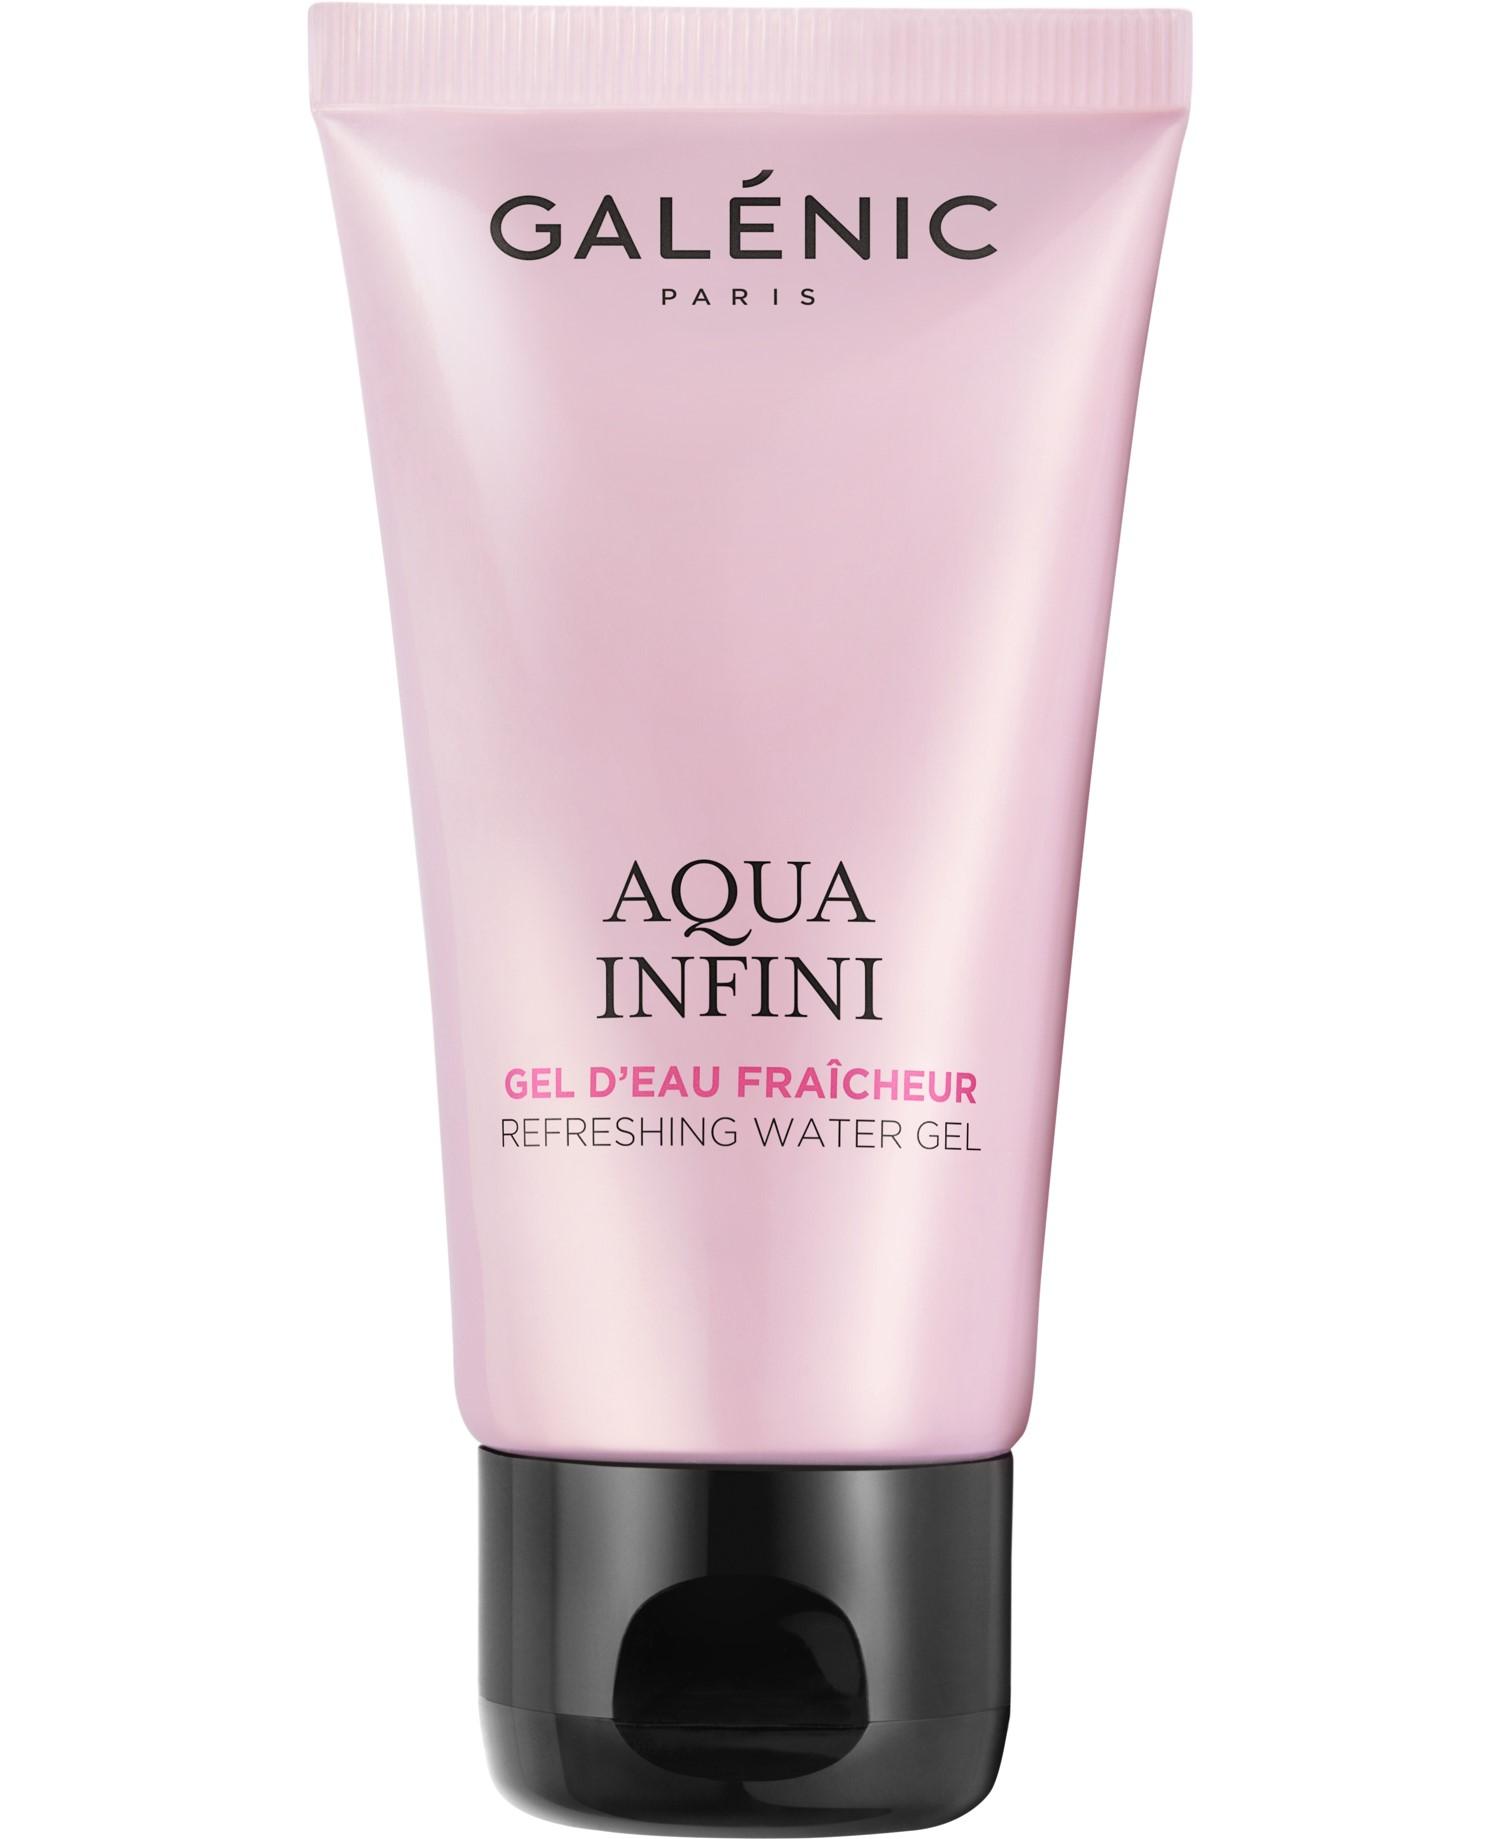 Gel de Agua Aqua infini 50 ml Galénic